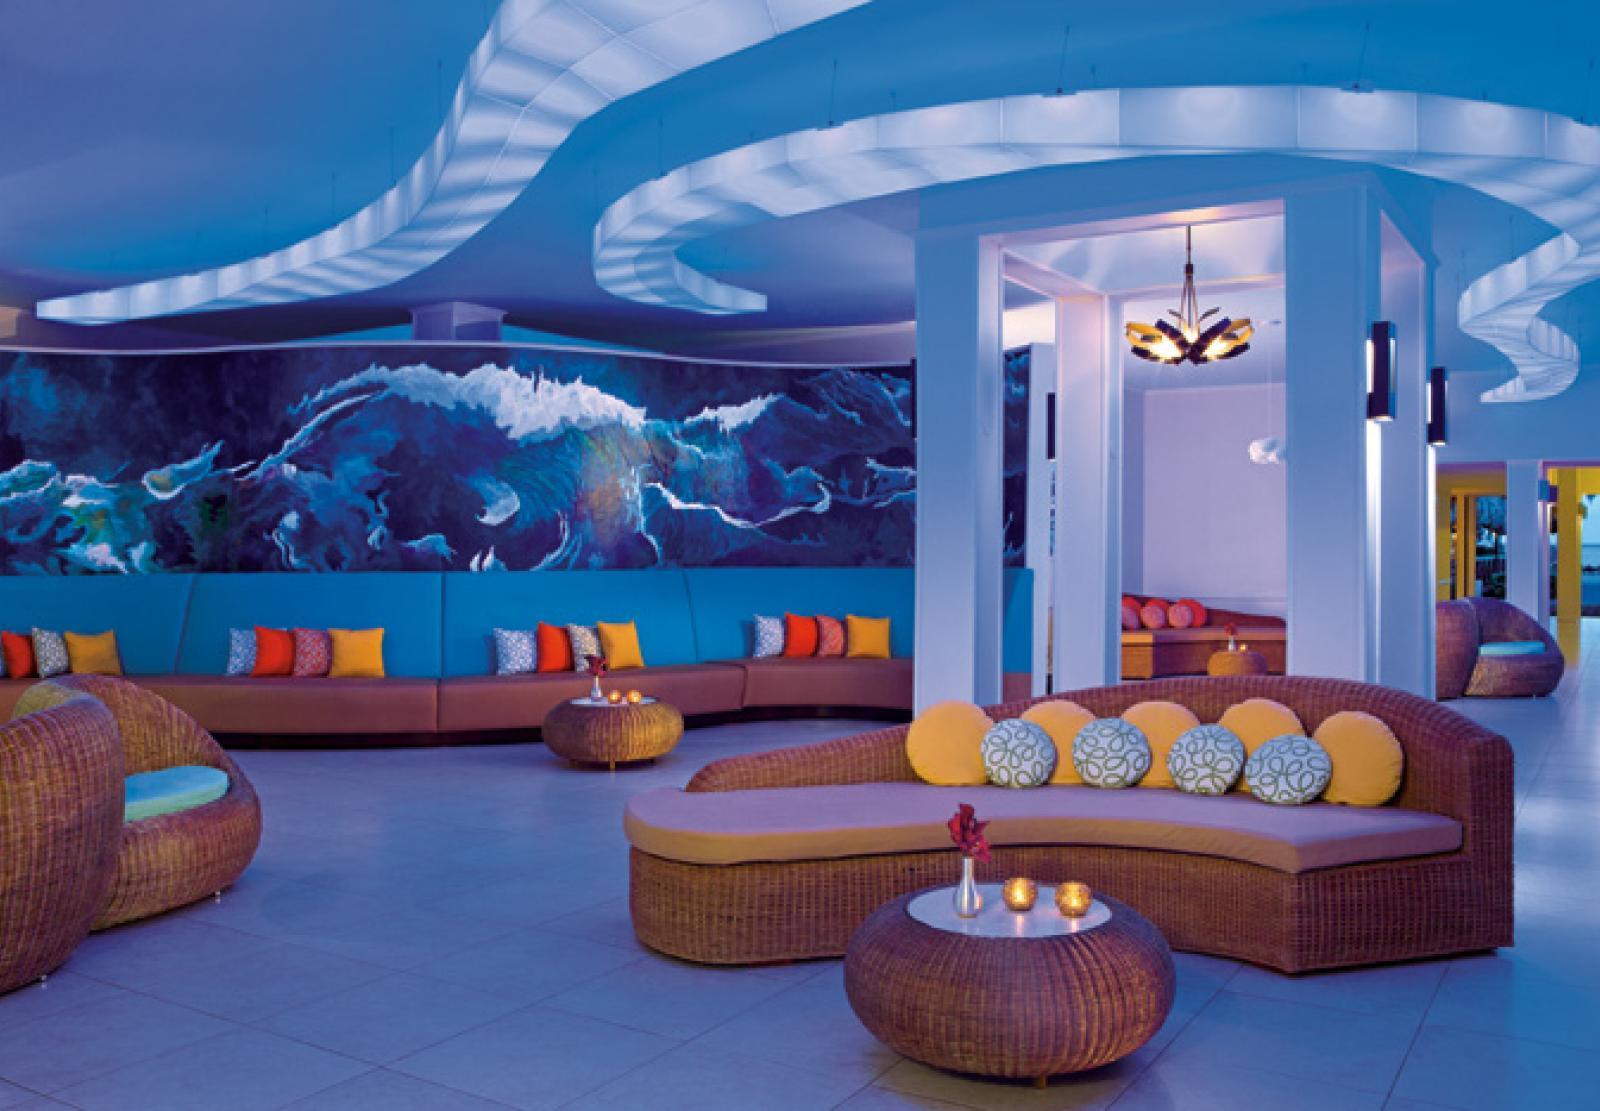 Superclubs breezes curacao resort spa & casino colusa casino resort